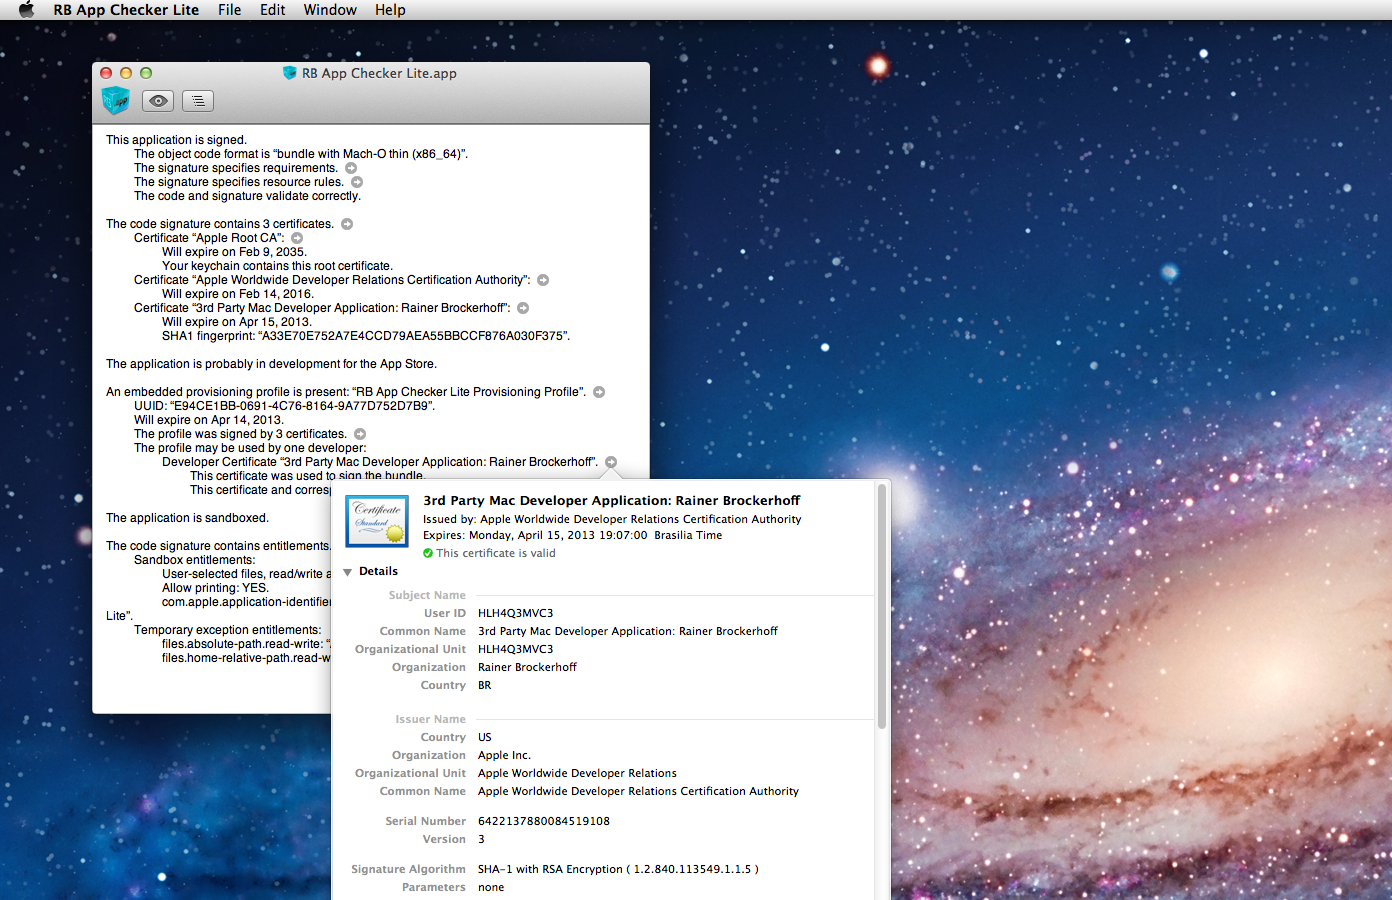 RB App Checker Lite - Mac